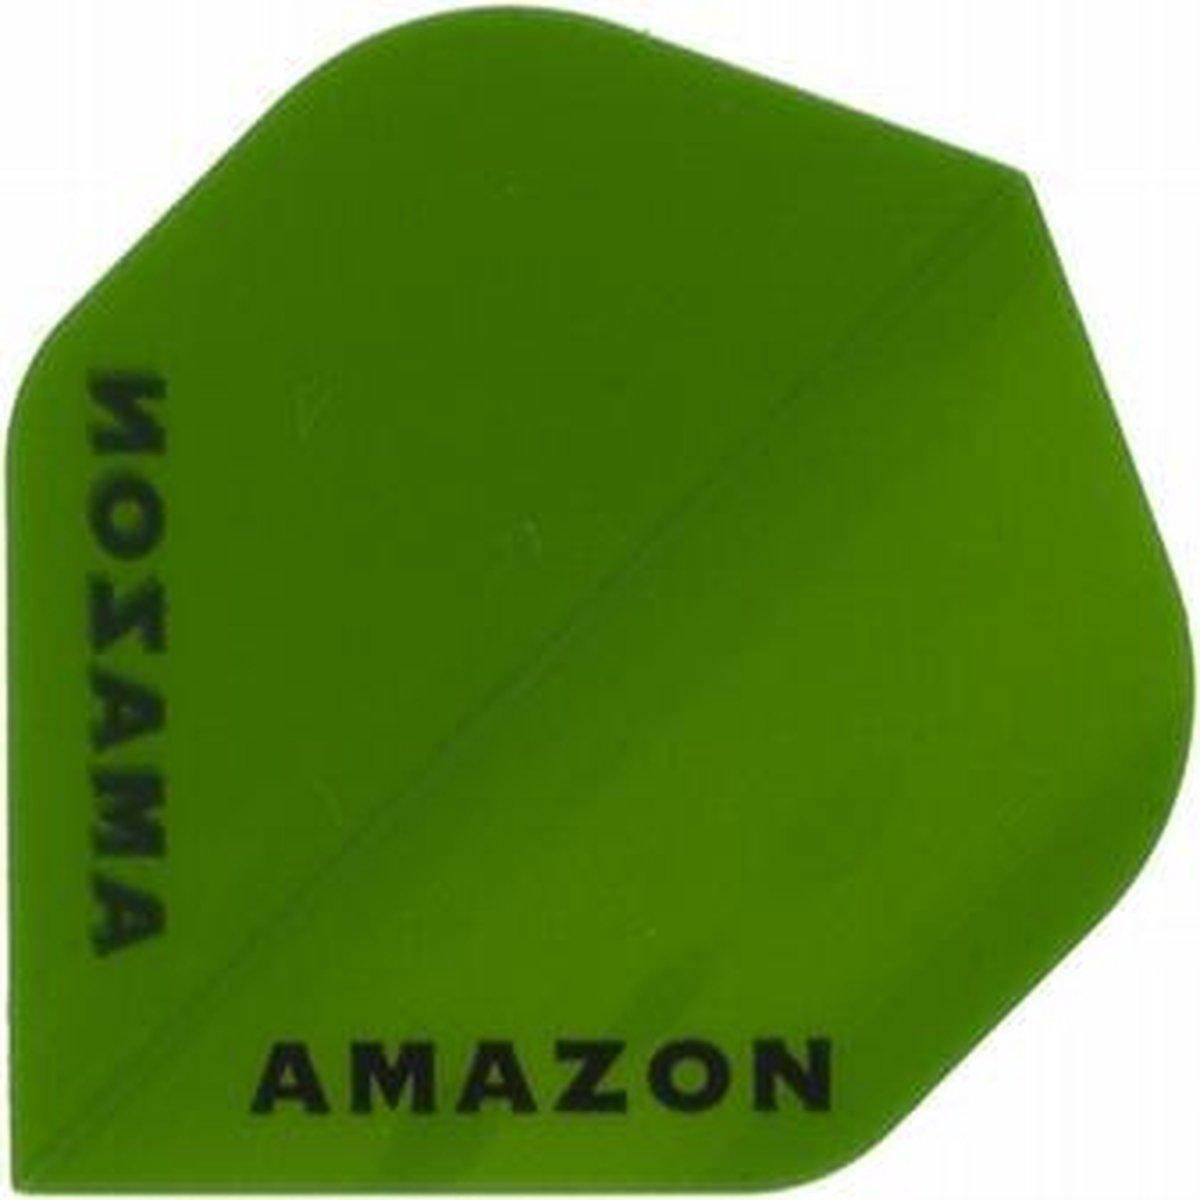 5 sets (15 stuks) Ruthless flights Amazon Transparant Std Green